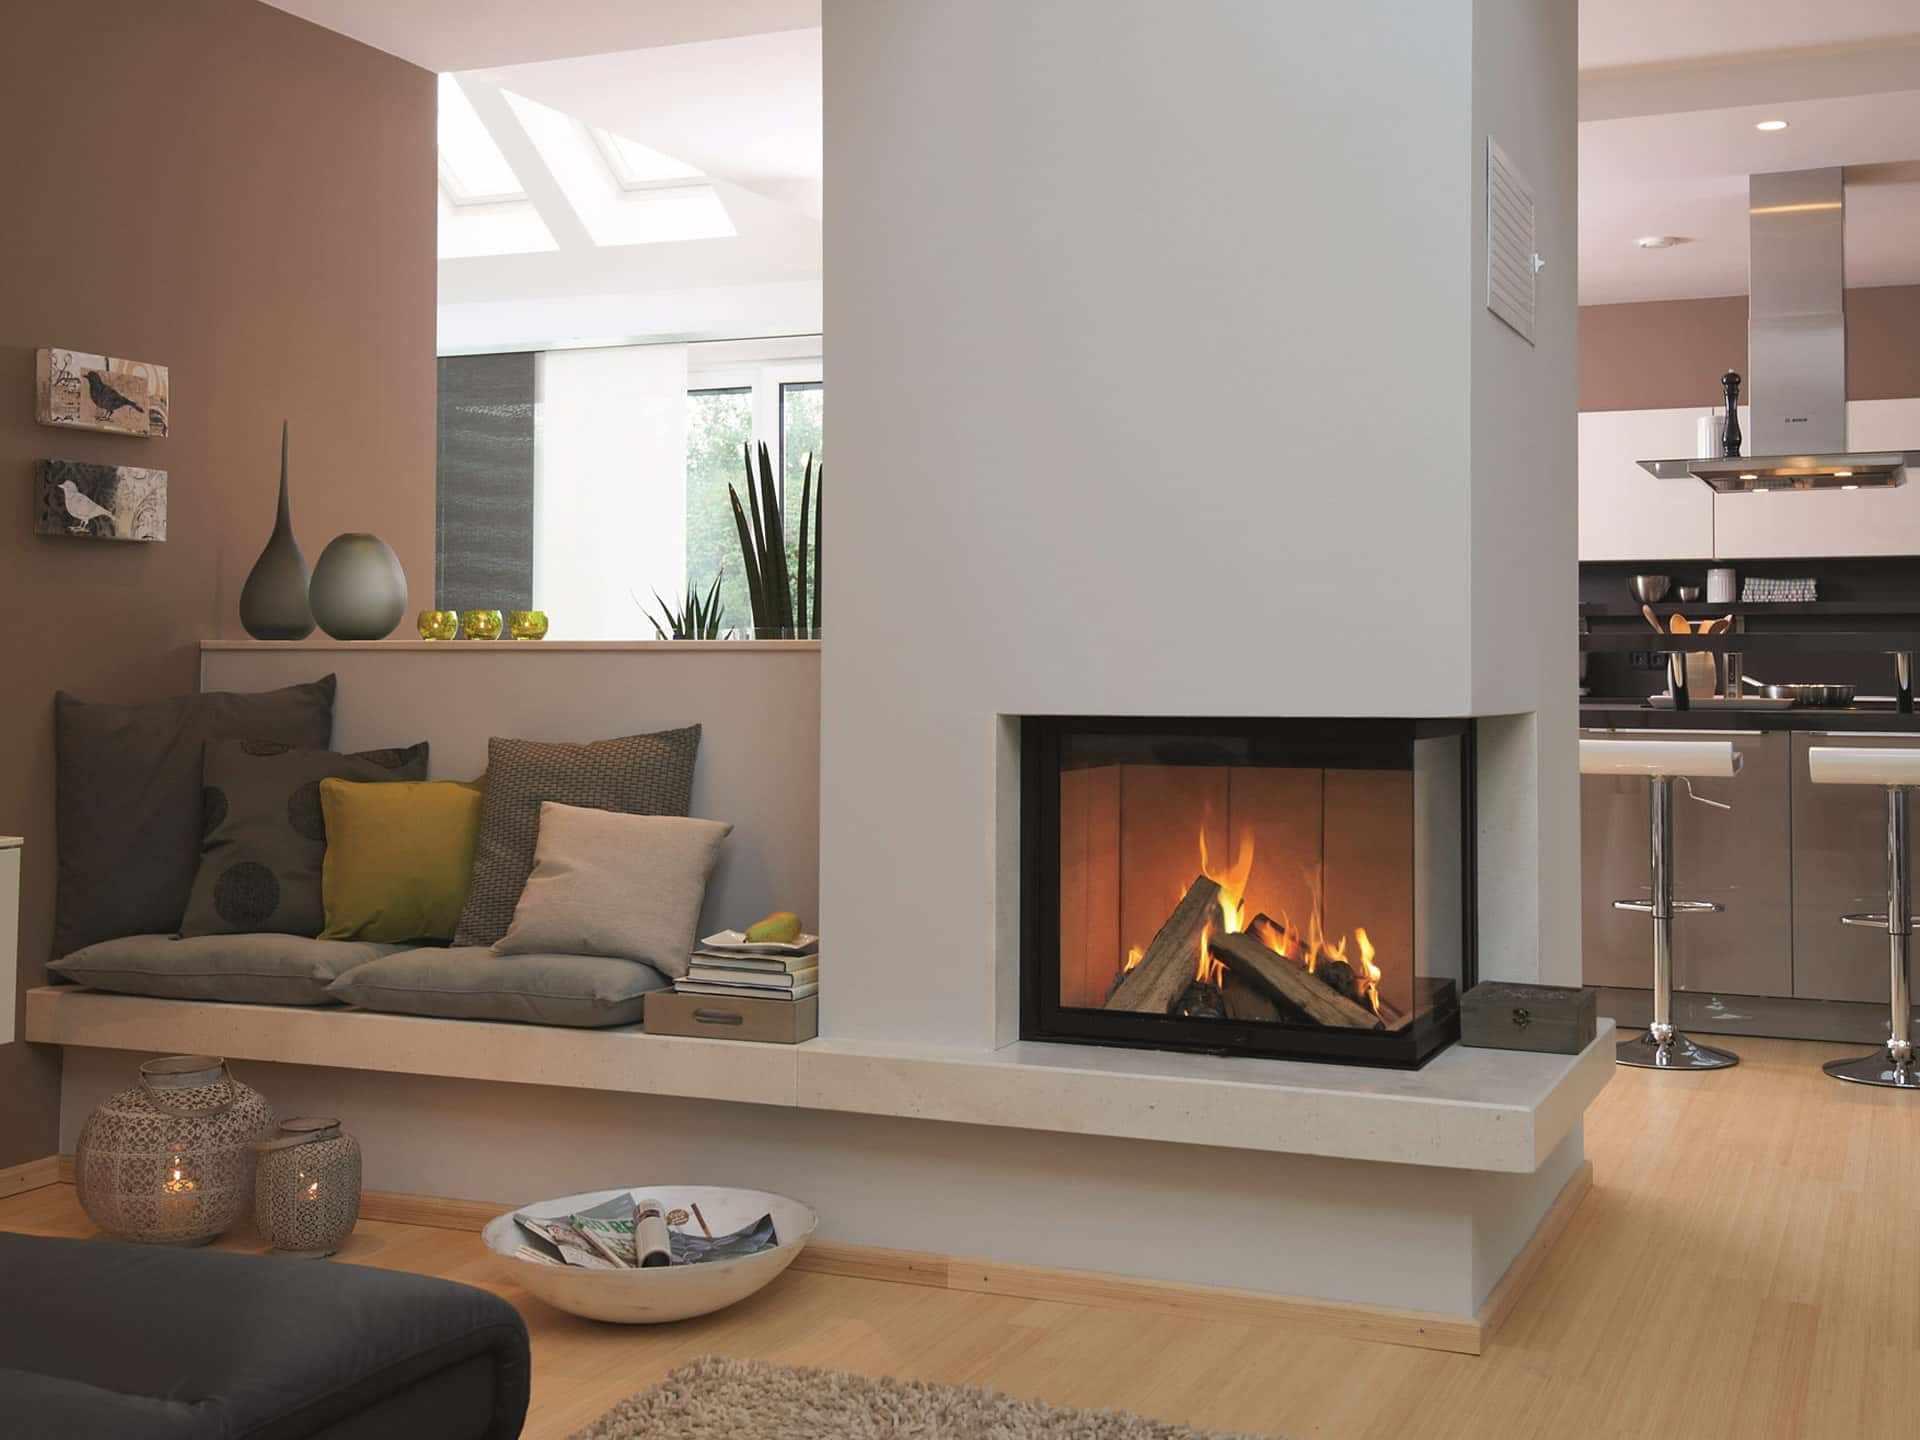 stadtvilla bauen anbieter preise grundrisse. Black Bedroom Furniture Sets. Home Design Ideas